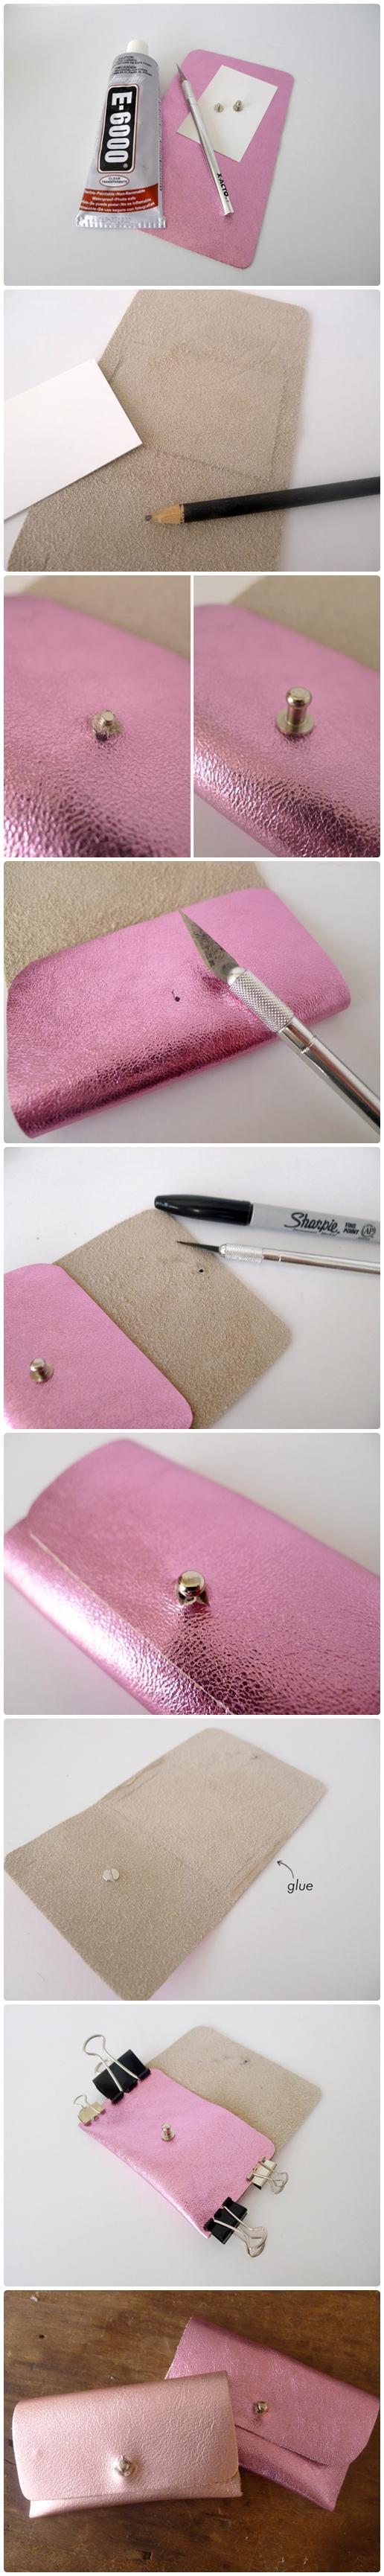 DIY NO-SEW BUSINESS CARD HOLDER | Leather DIYs | Pinterest ...